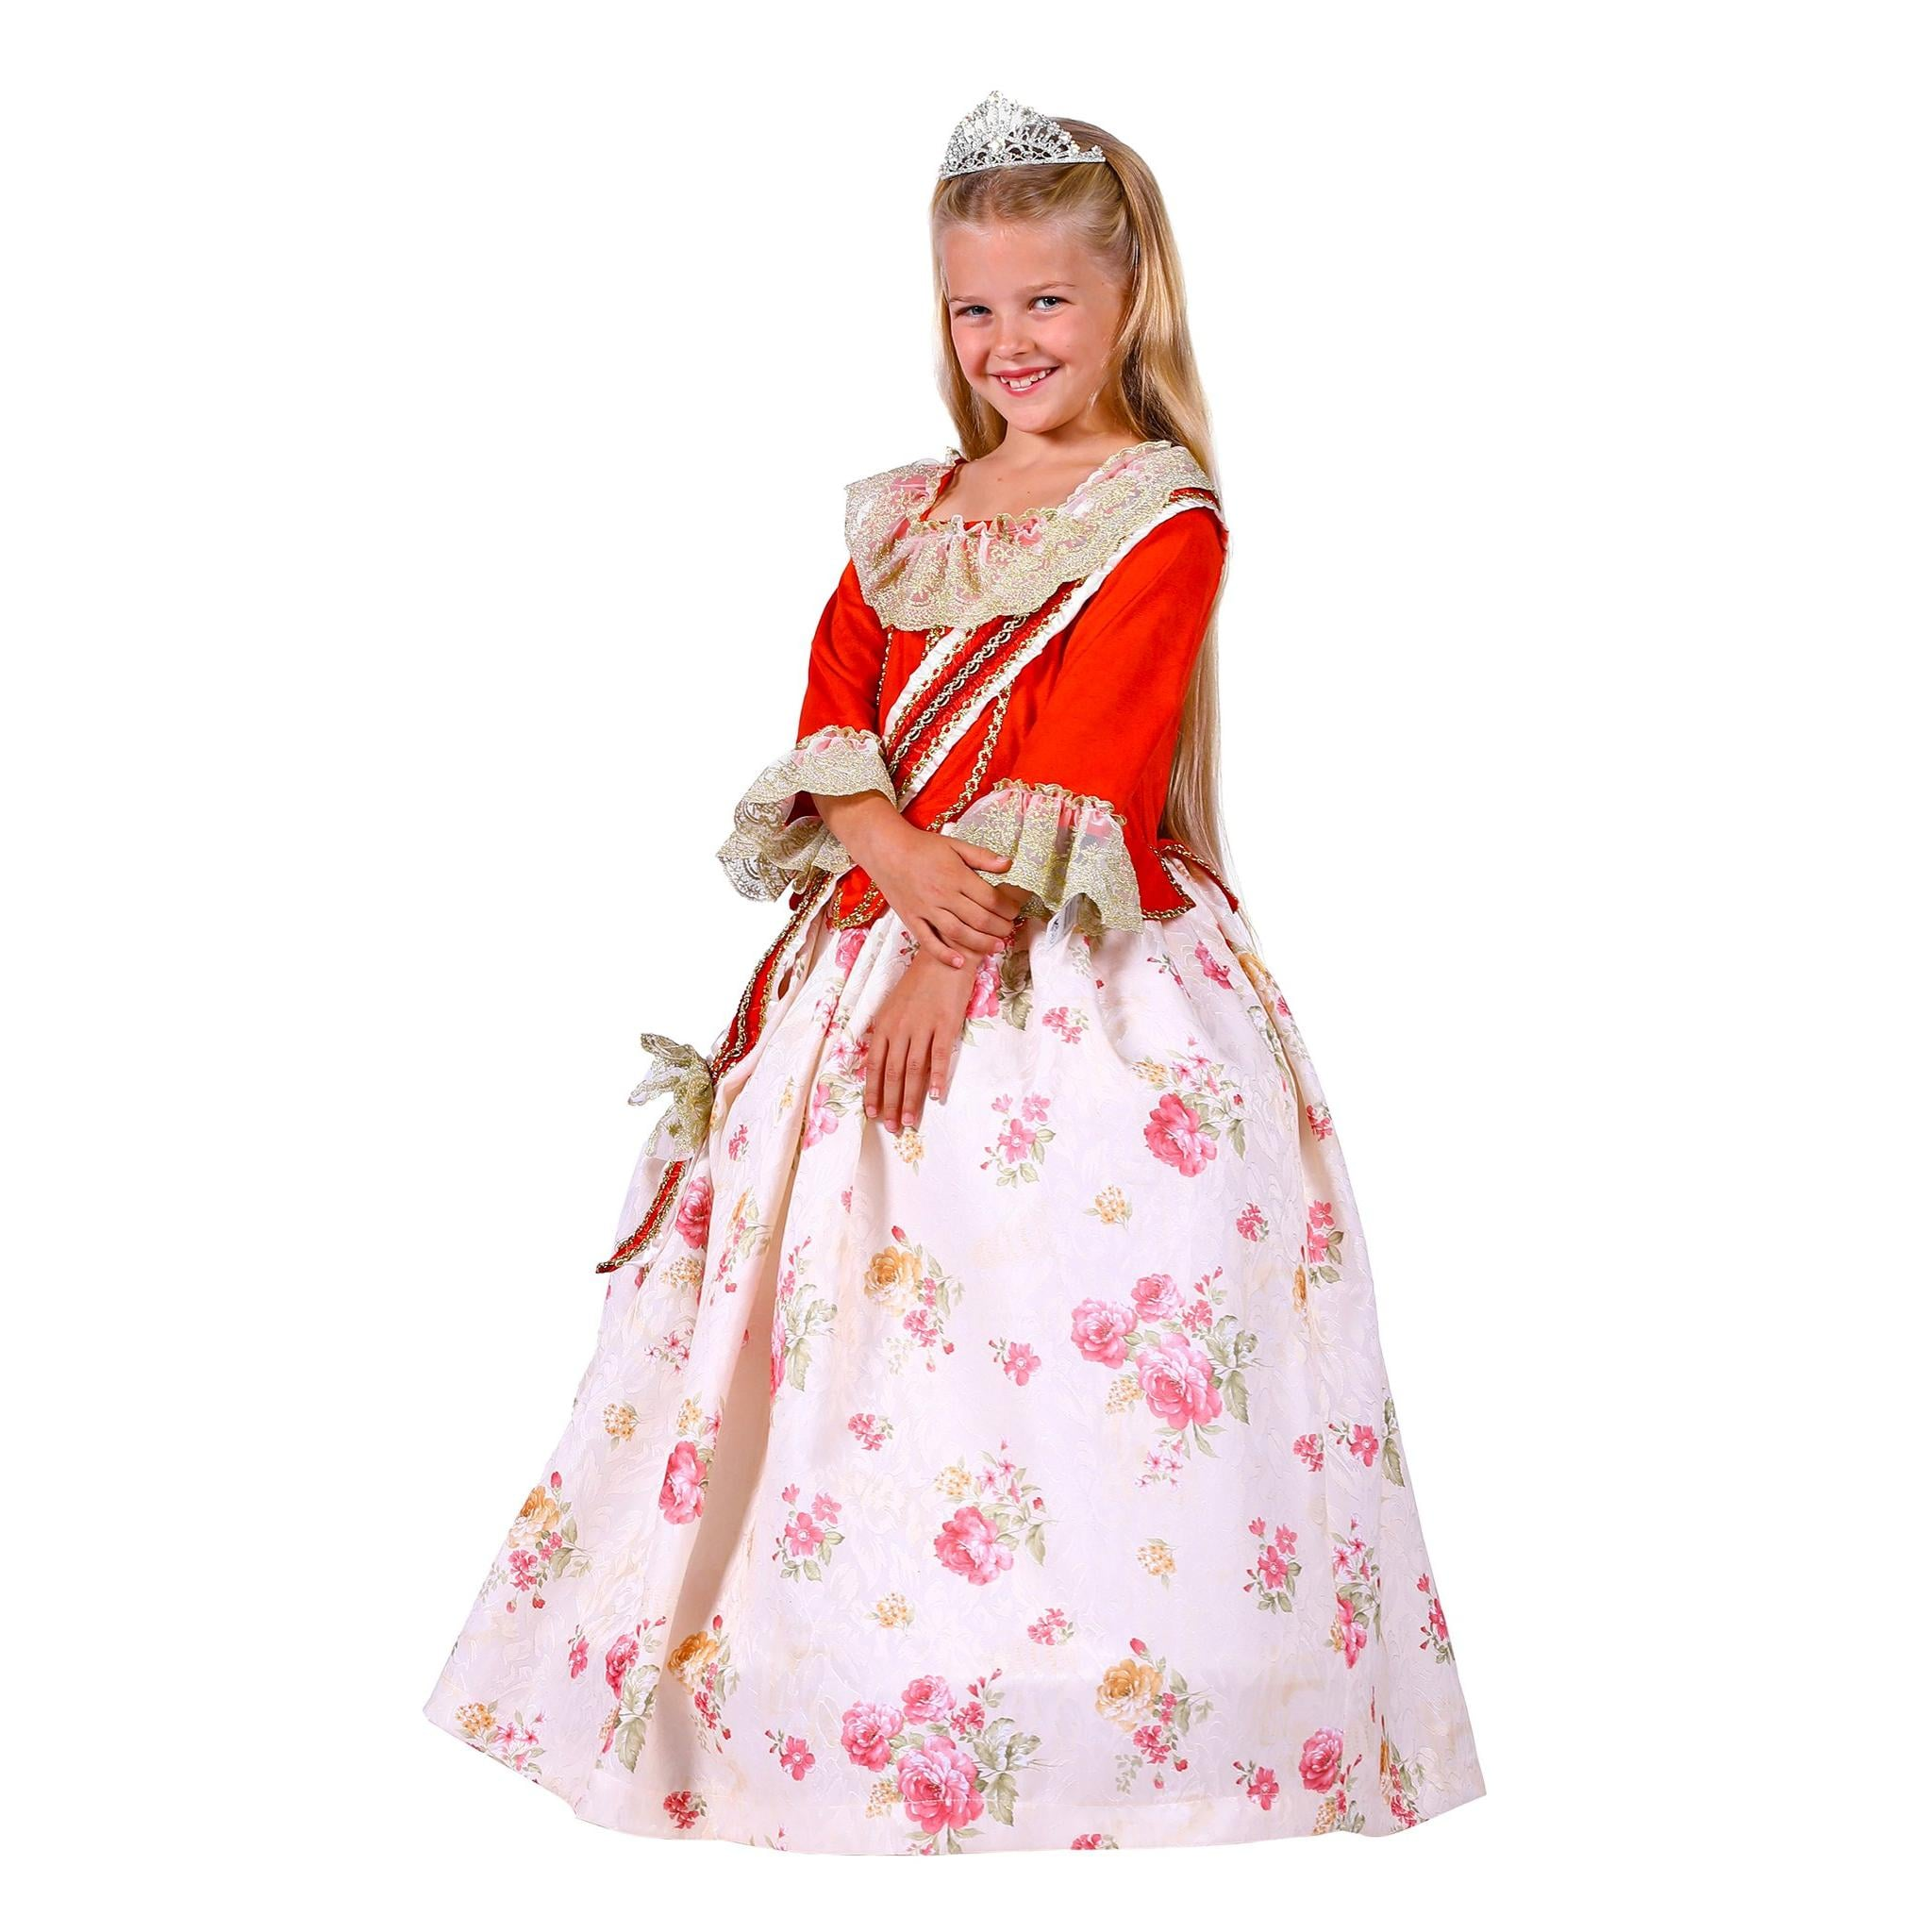 Thetru Barocke Prinzessin Kinderkostüm